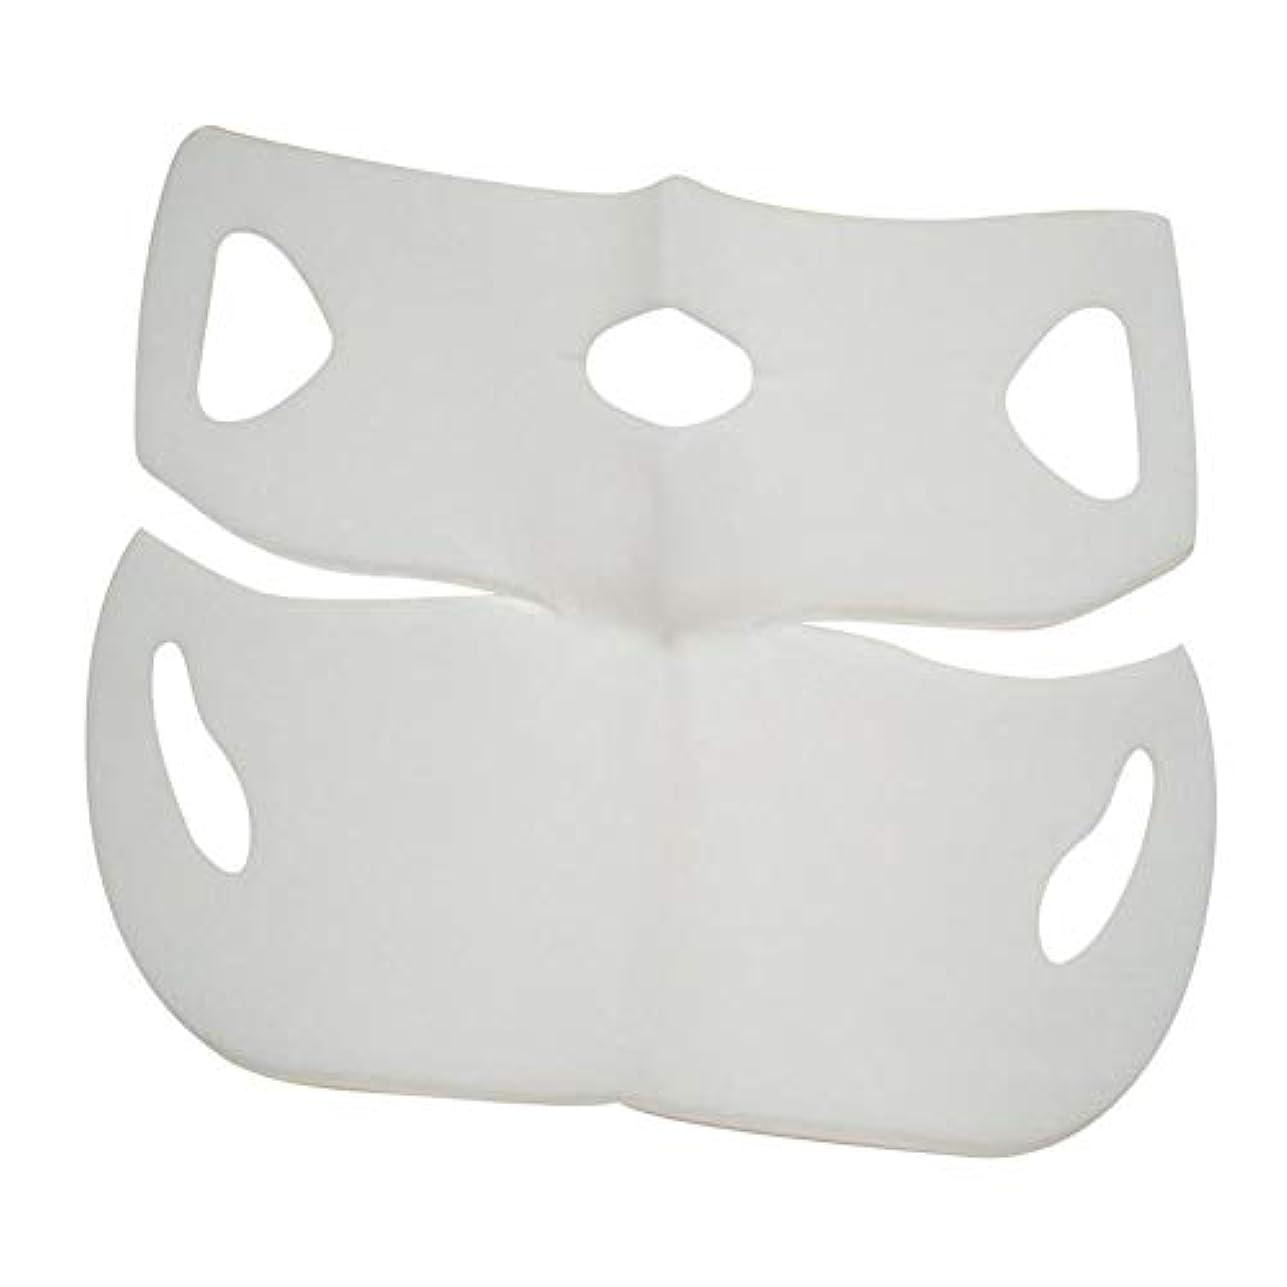 SILUN 最新型 4D Vフェイシャルマスク フェイスマスク 小顔 マスク フェイスラインベルト 美顔 顔痩せ 肌ケア 保湿 毛細血管収縮 睡眠マスク